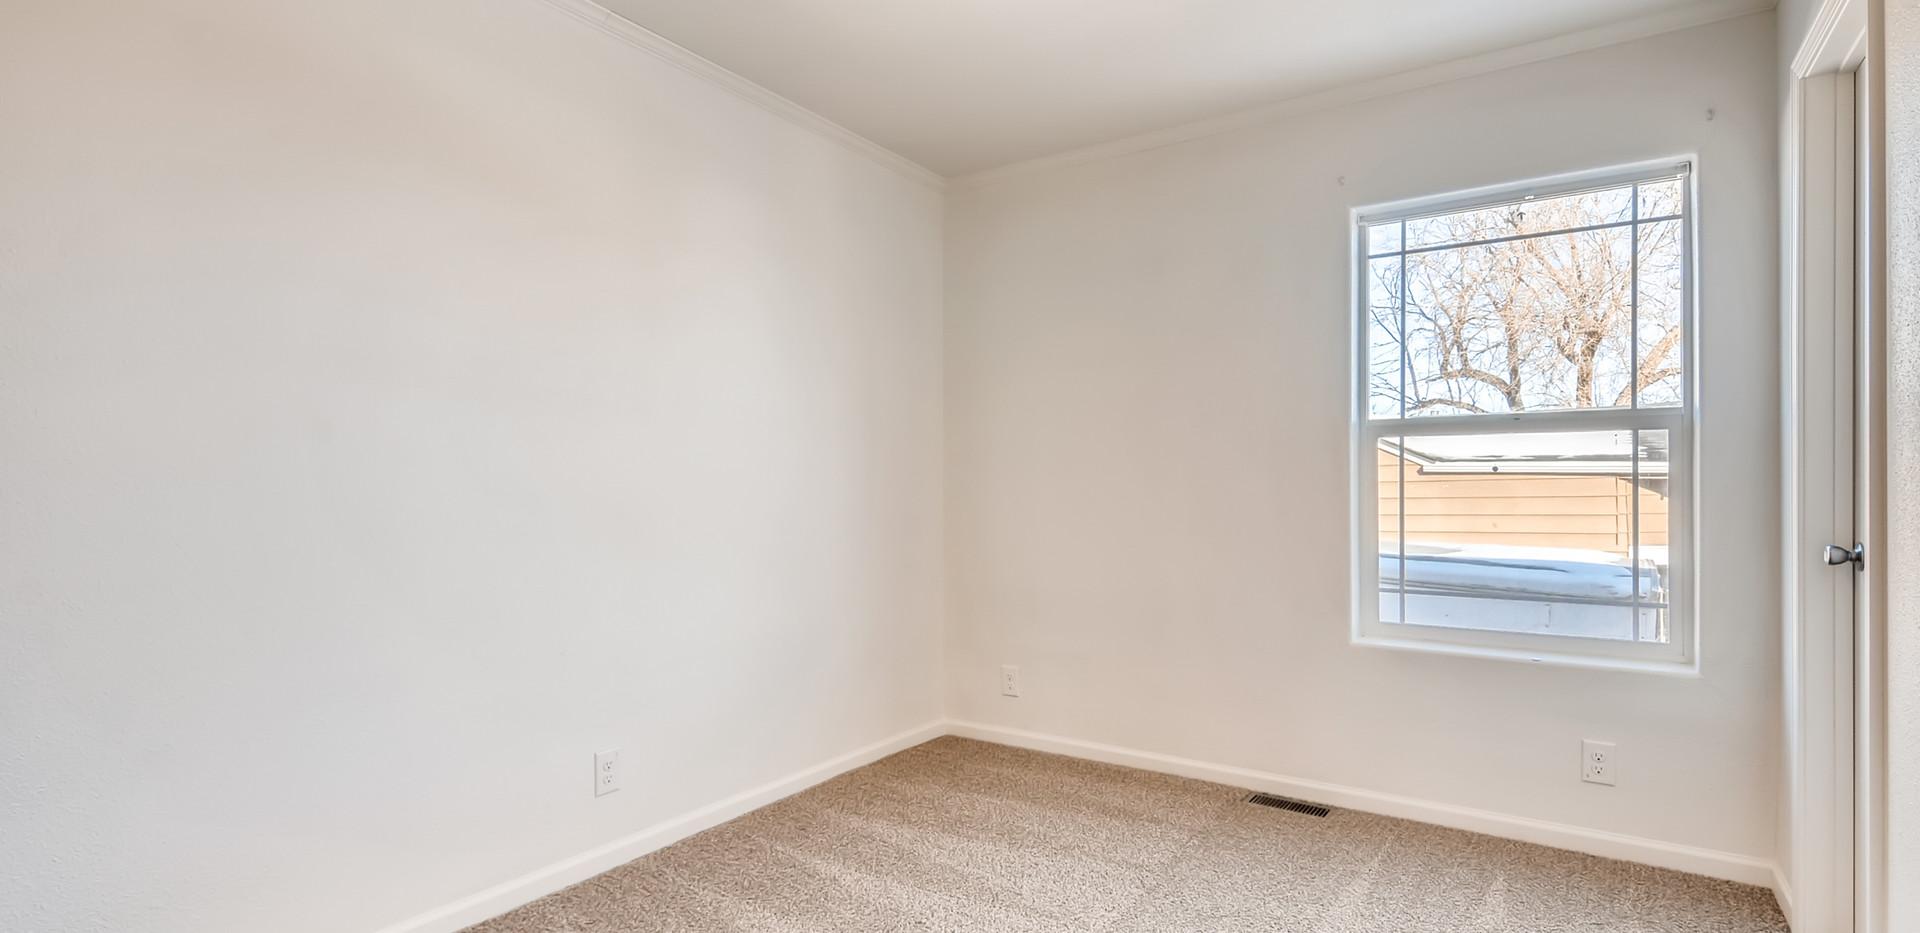 Bedroom #1.jpg